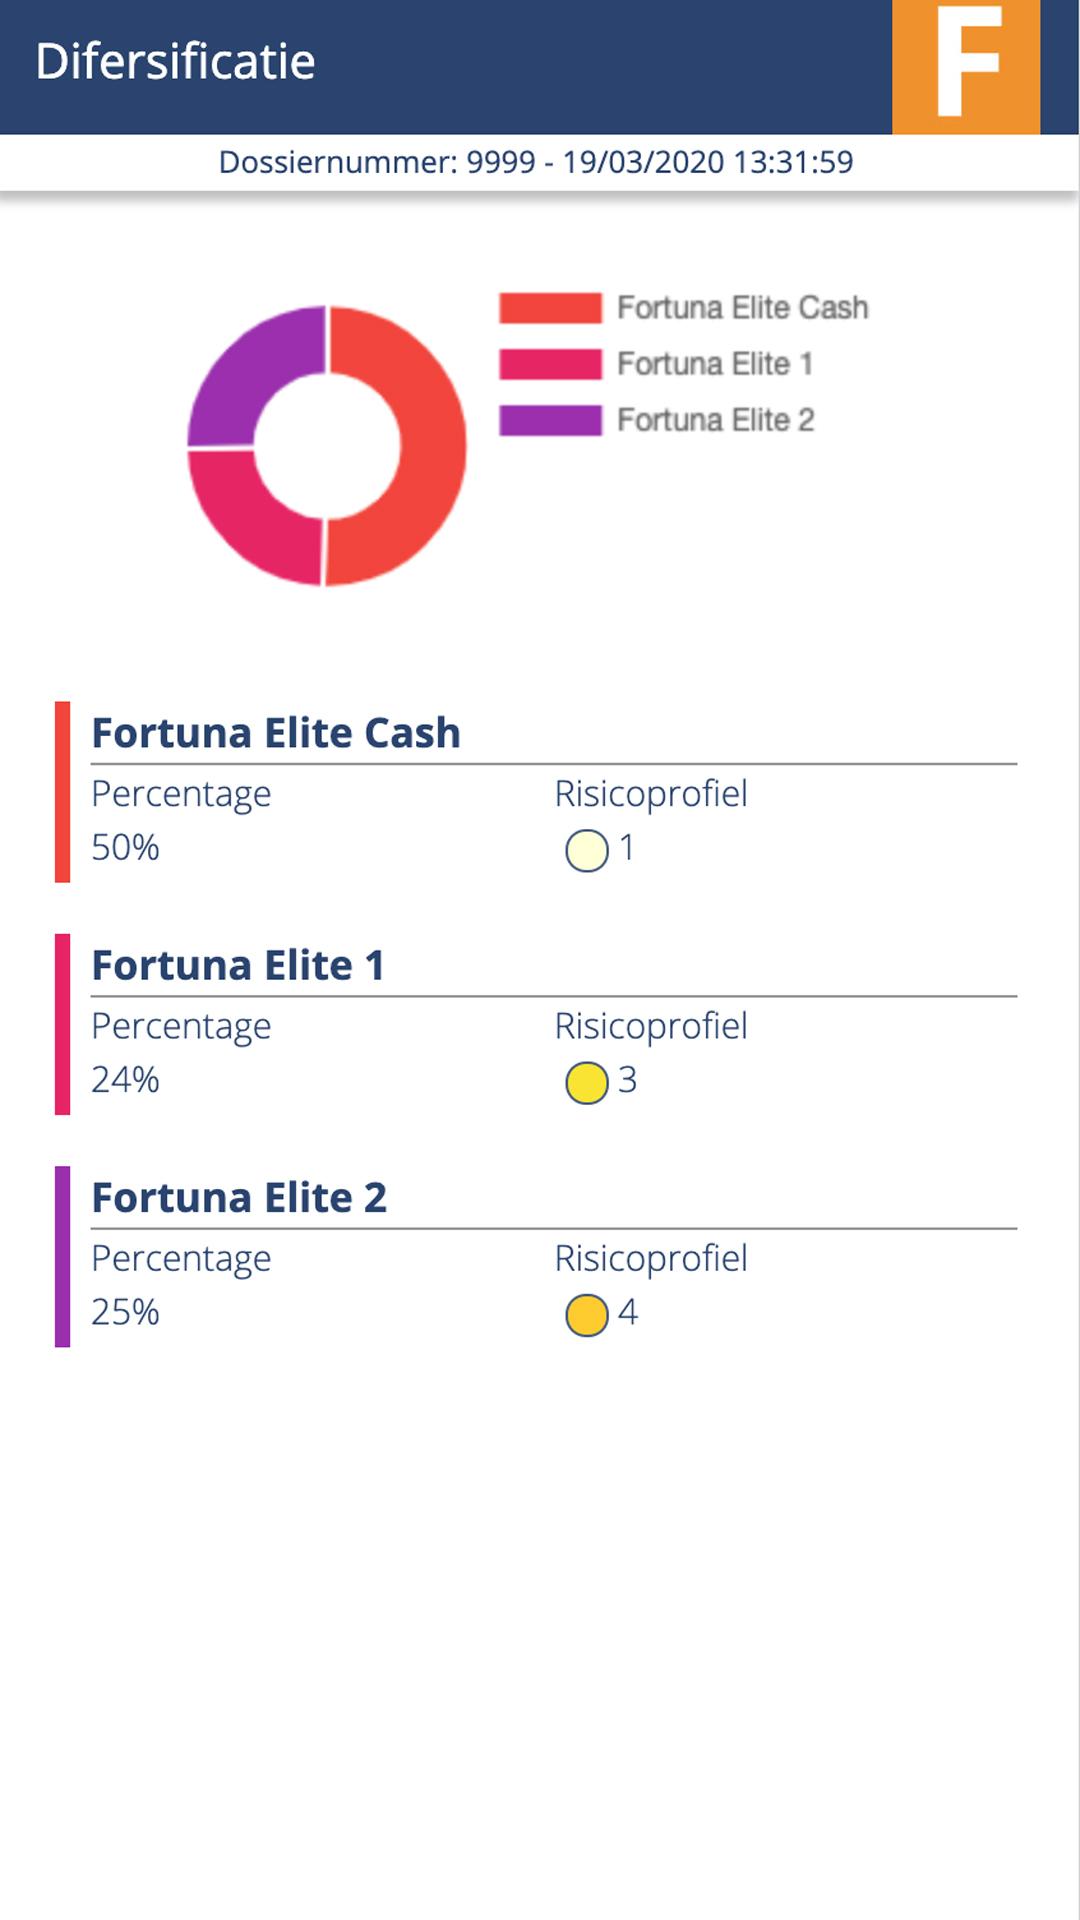 Fortuna Mobile app preview Difersificatie